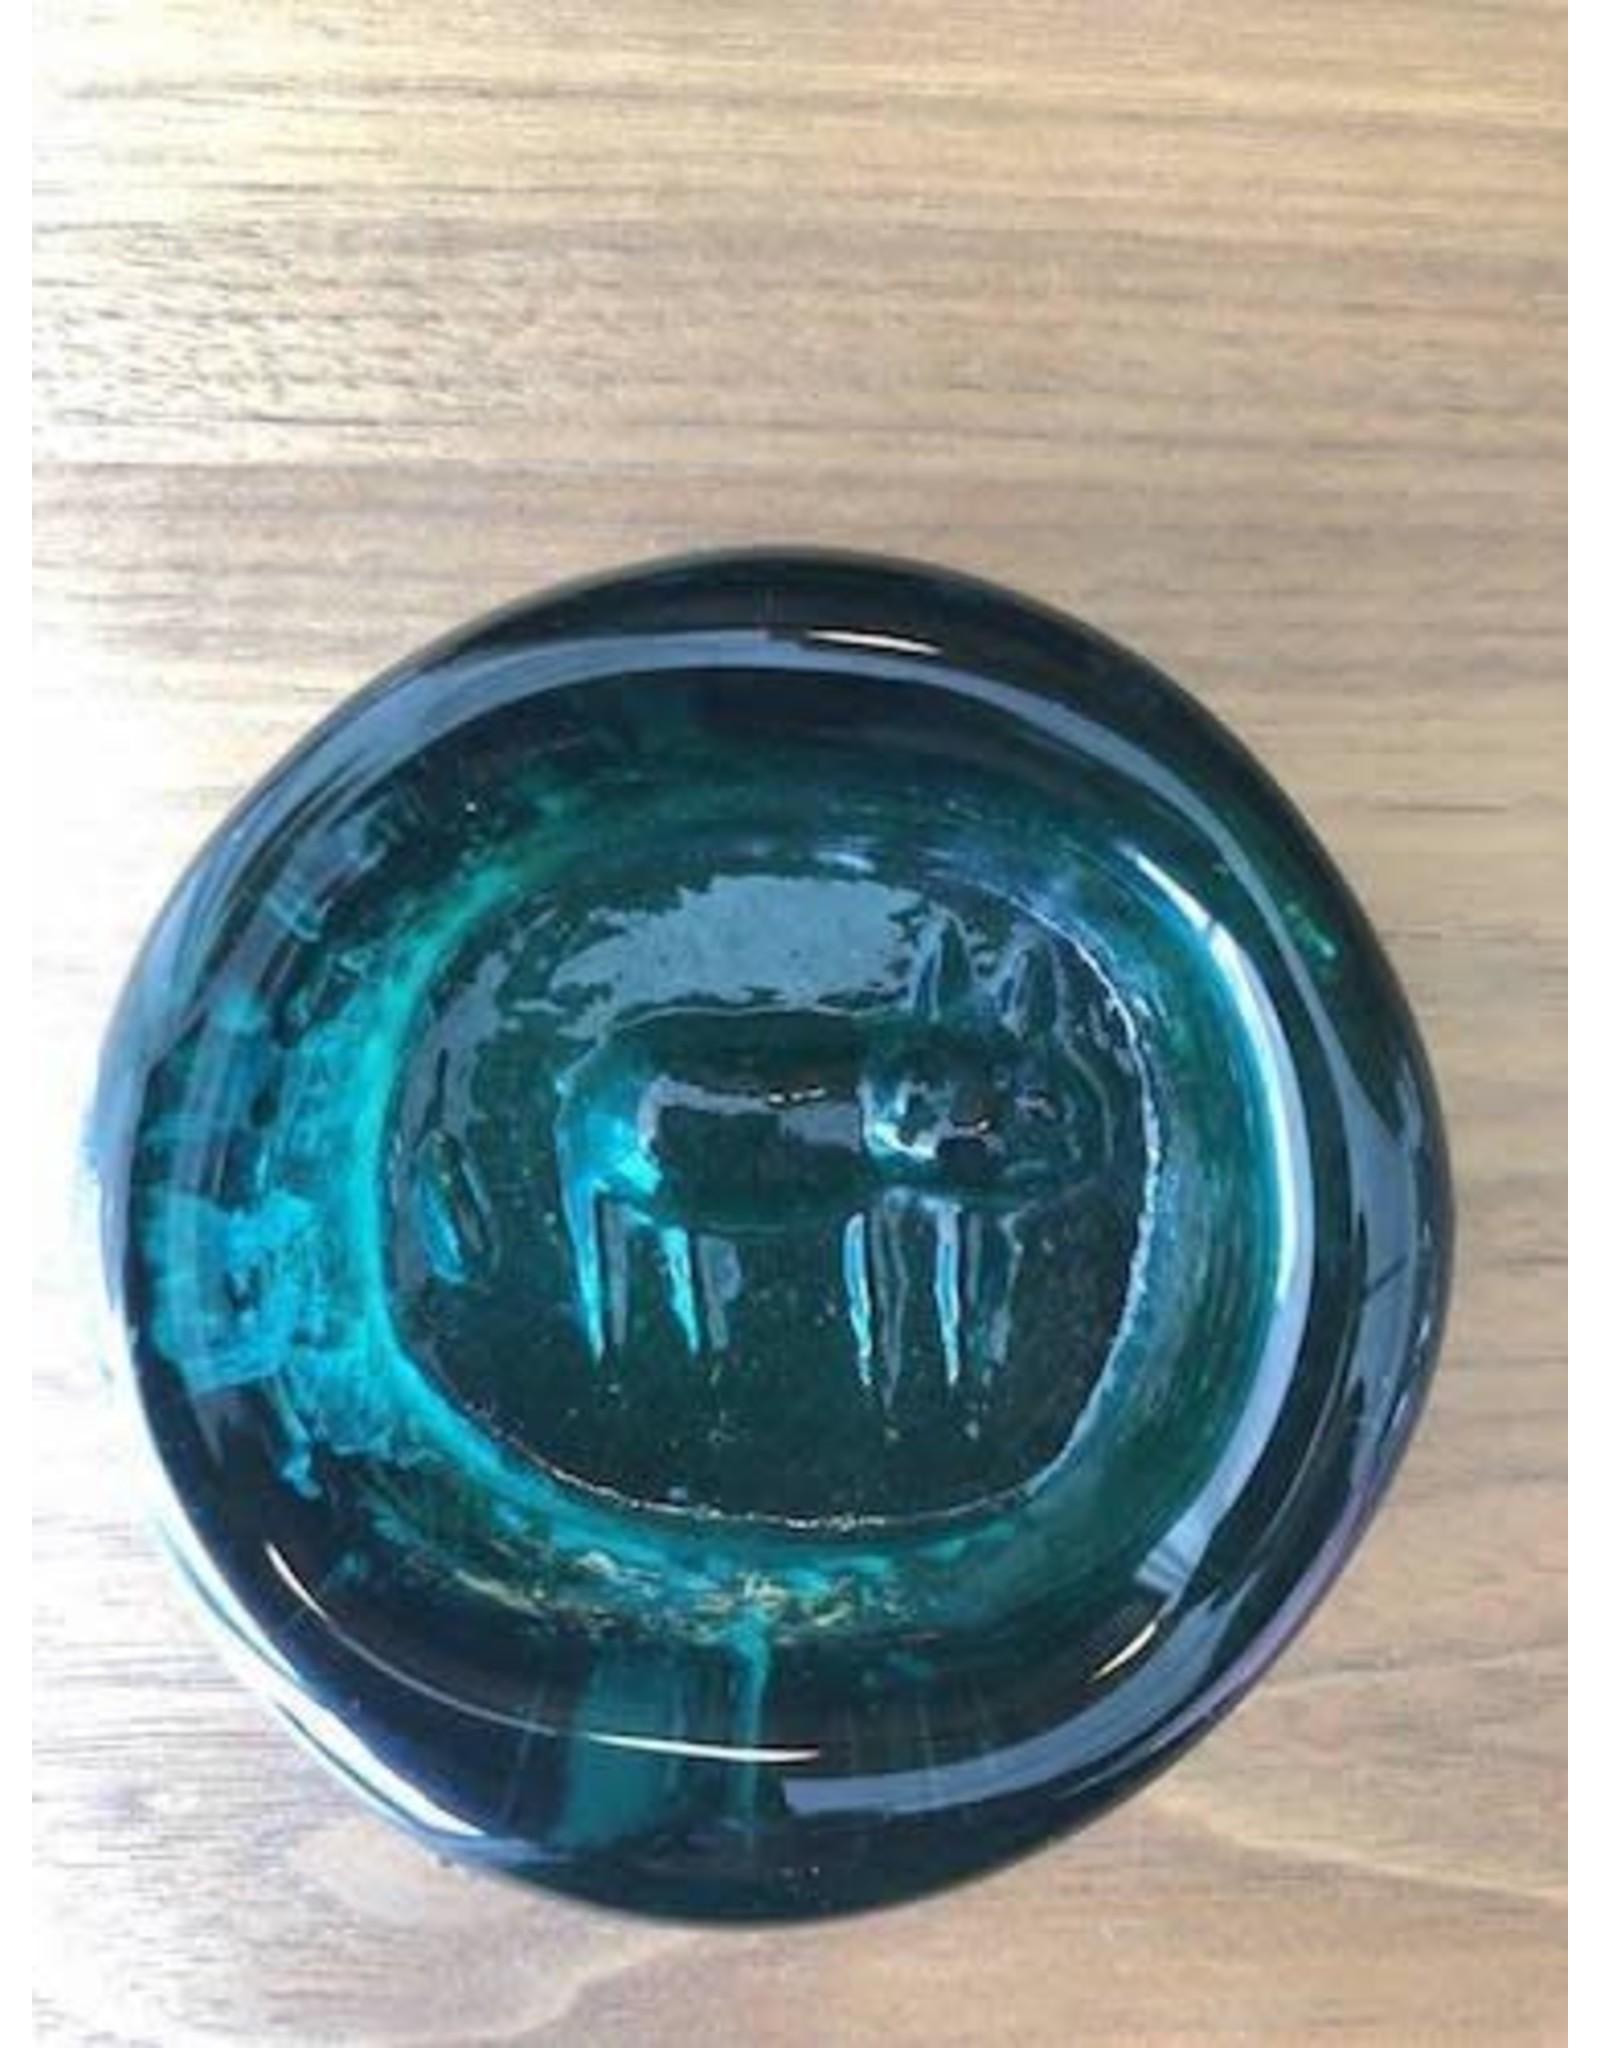 MANKS ANTIQUES HOGLUND AQUA GLASS PAPERWEIGHTS